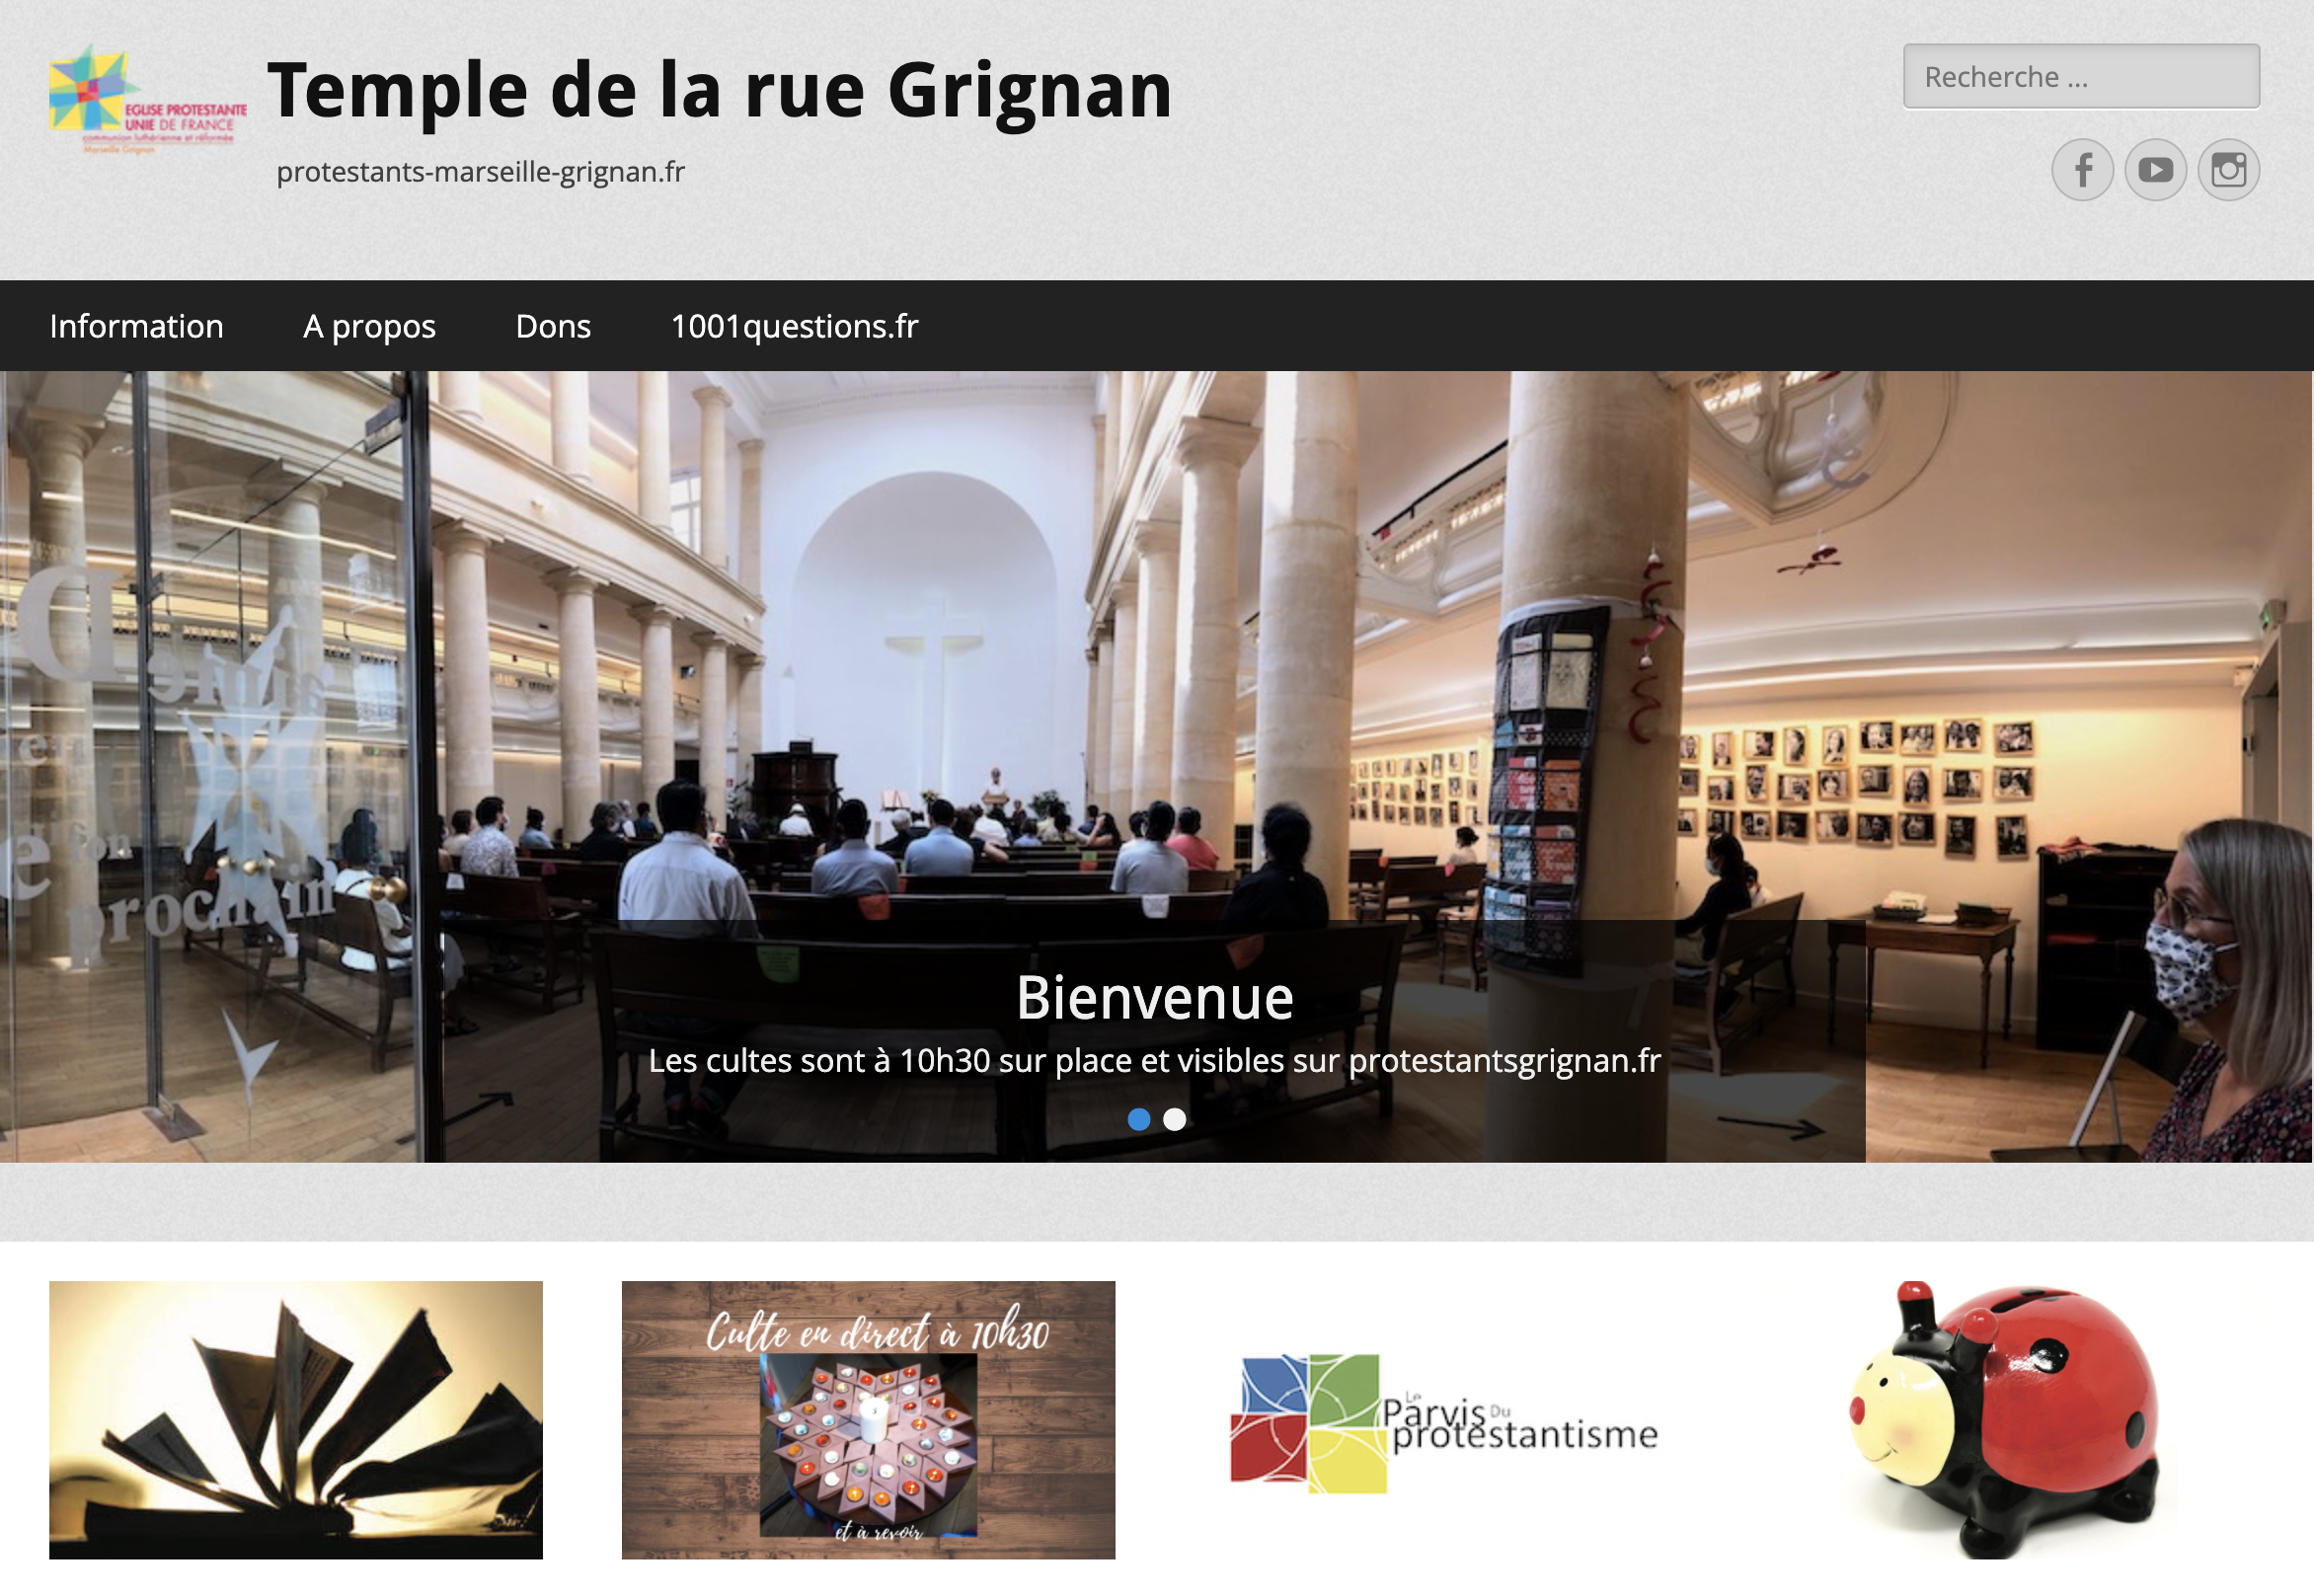 15 rue Grignan